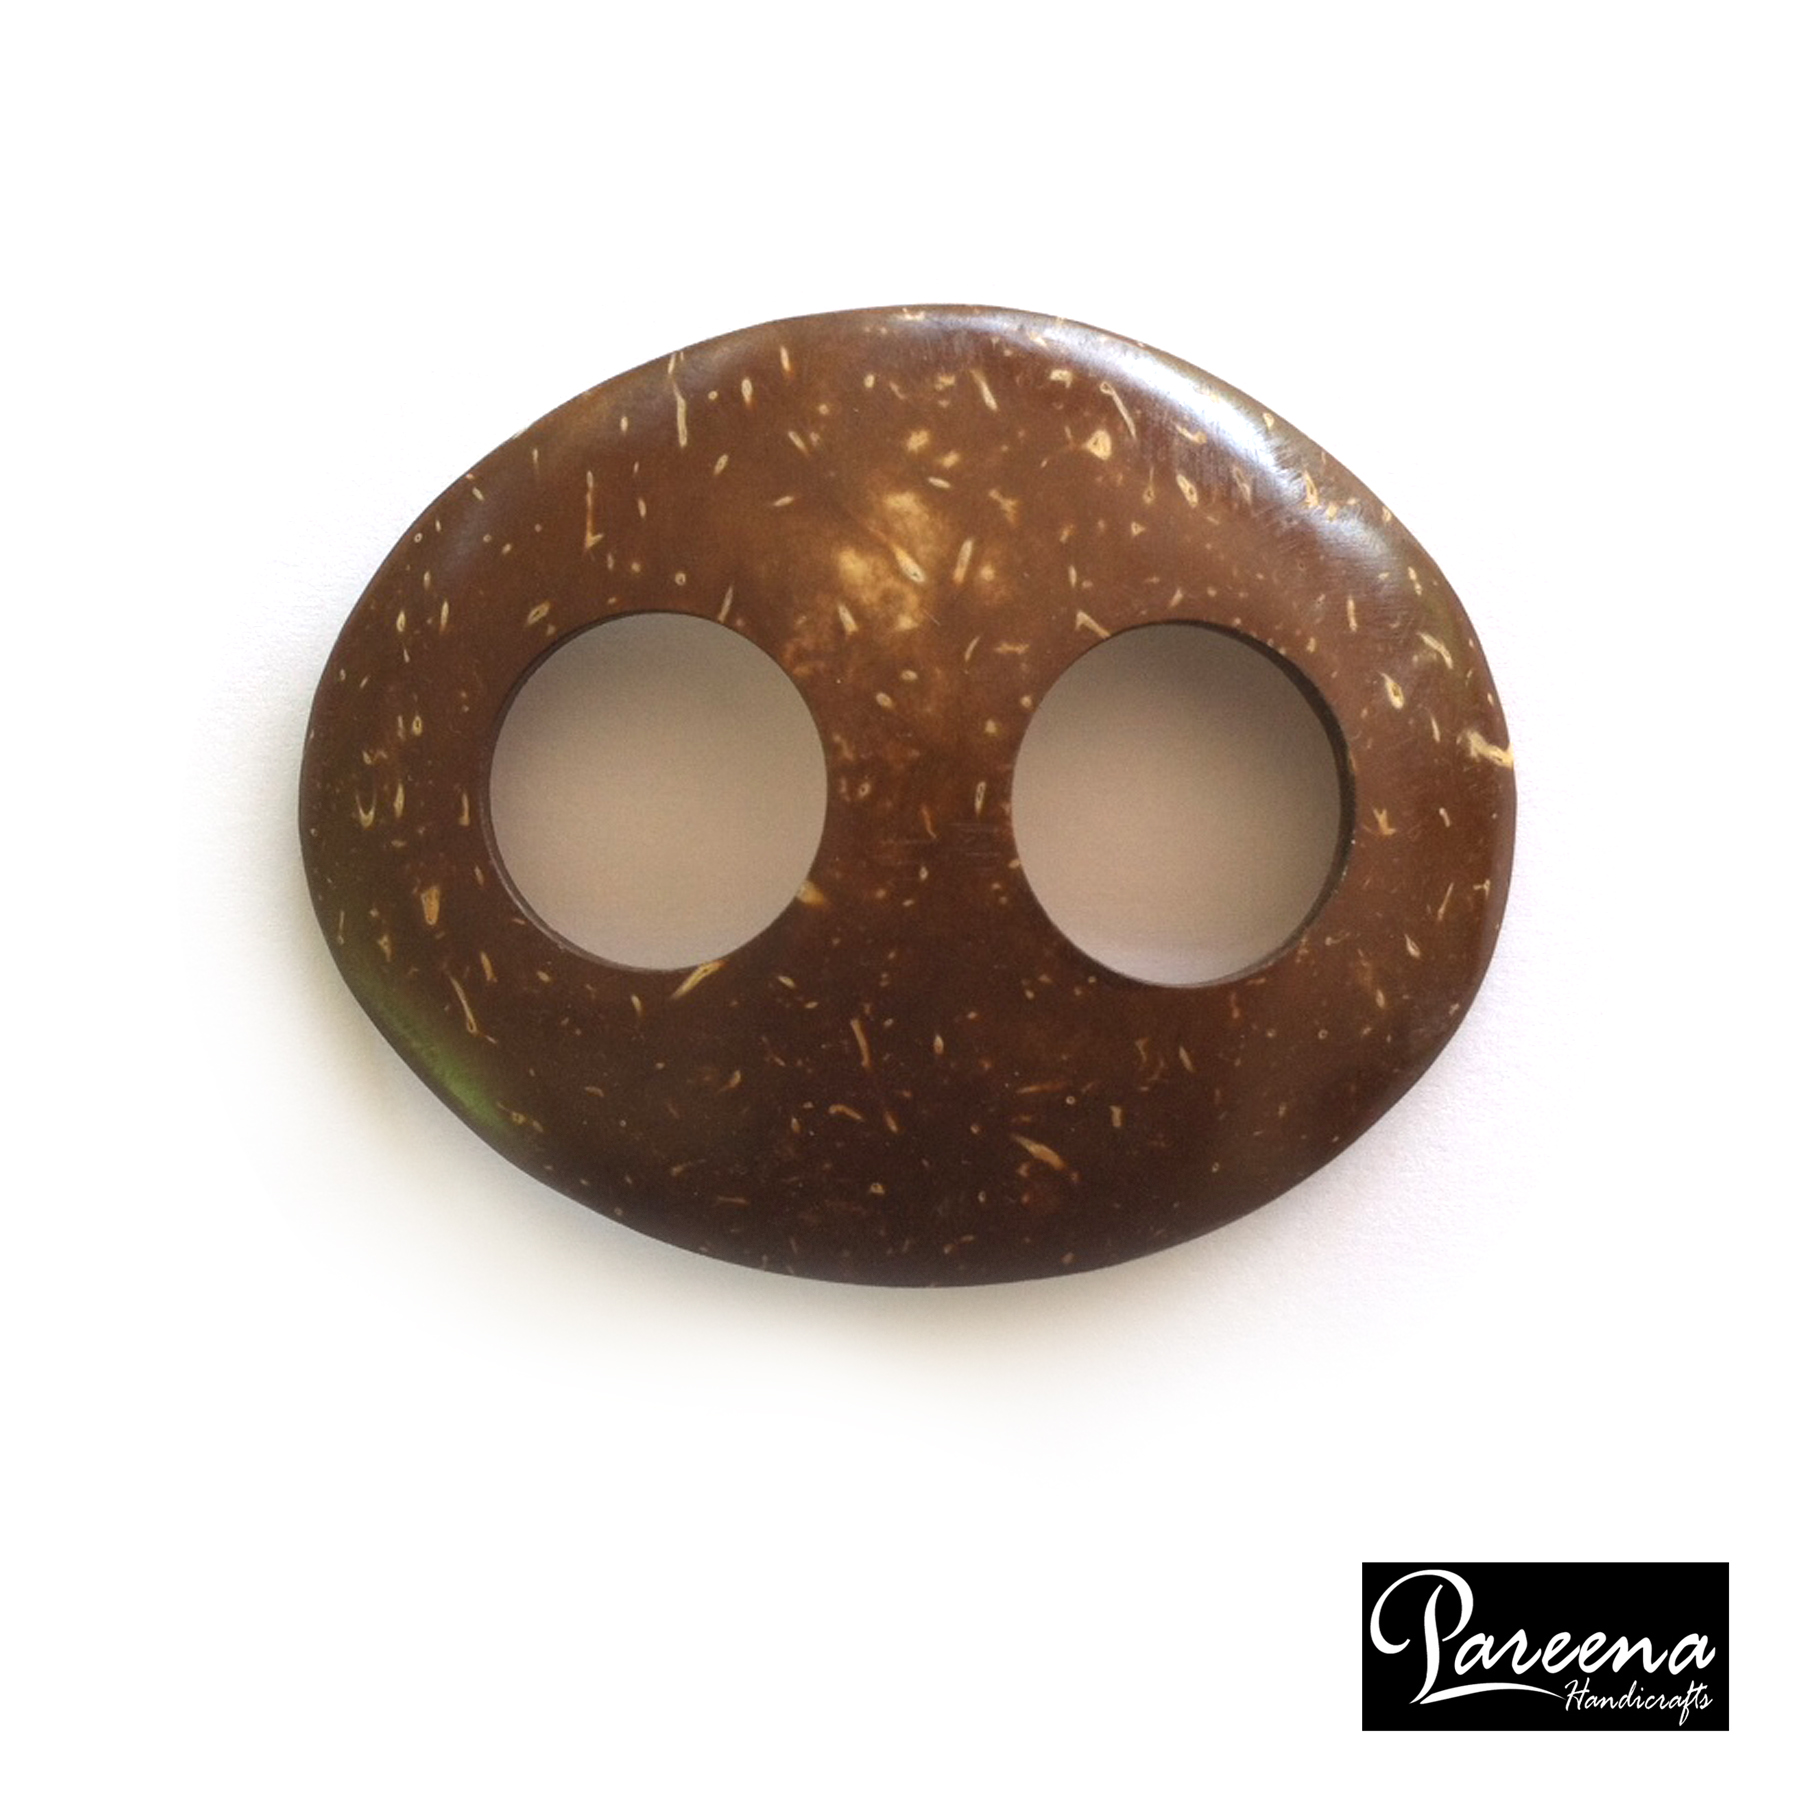 Coconut Shell Buckle Oval (หัวเข็มขัดกะลามะพร้าวรูปวงรี)